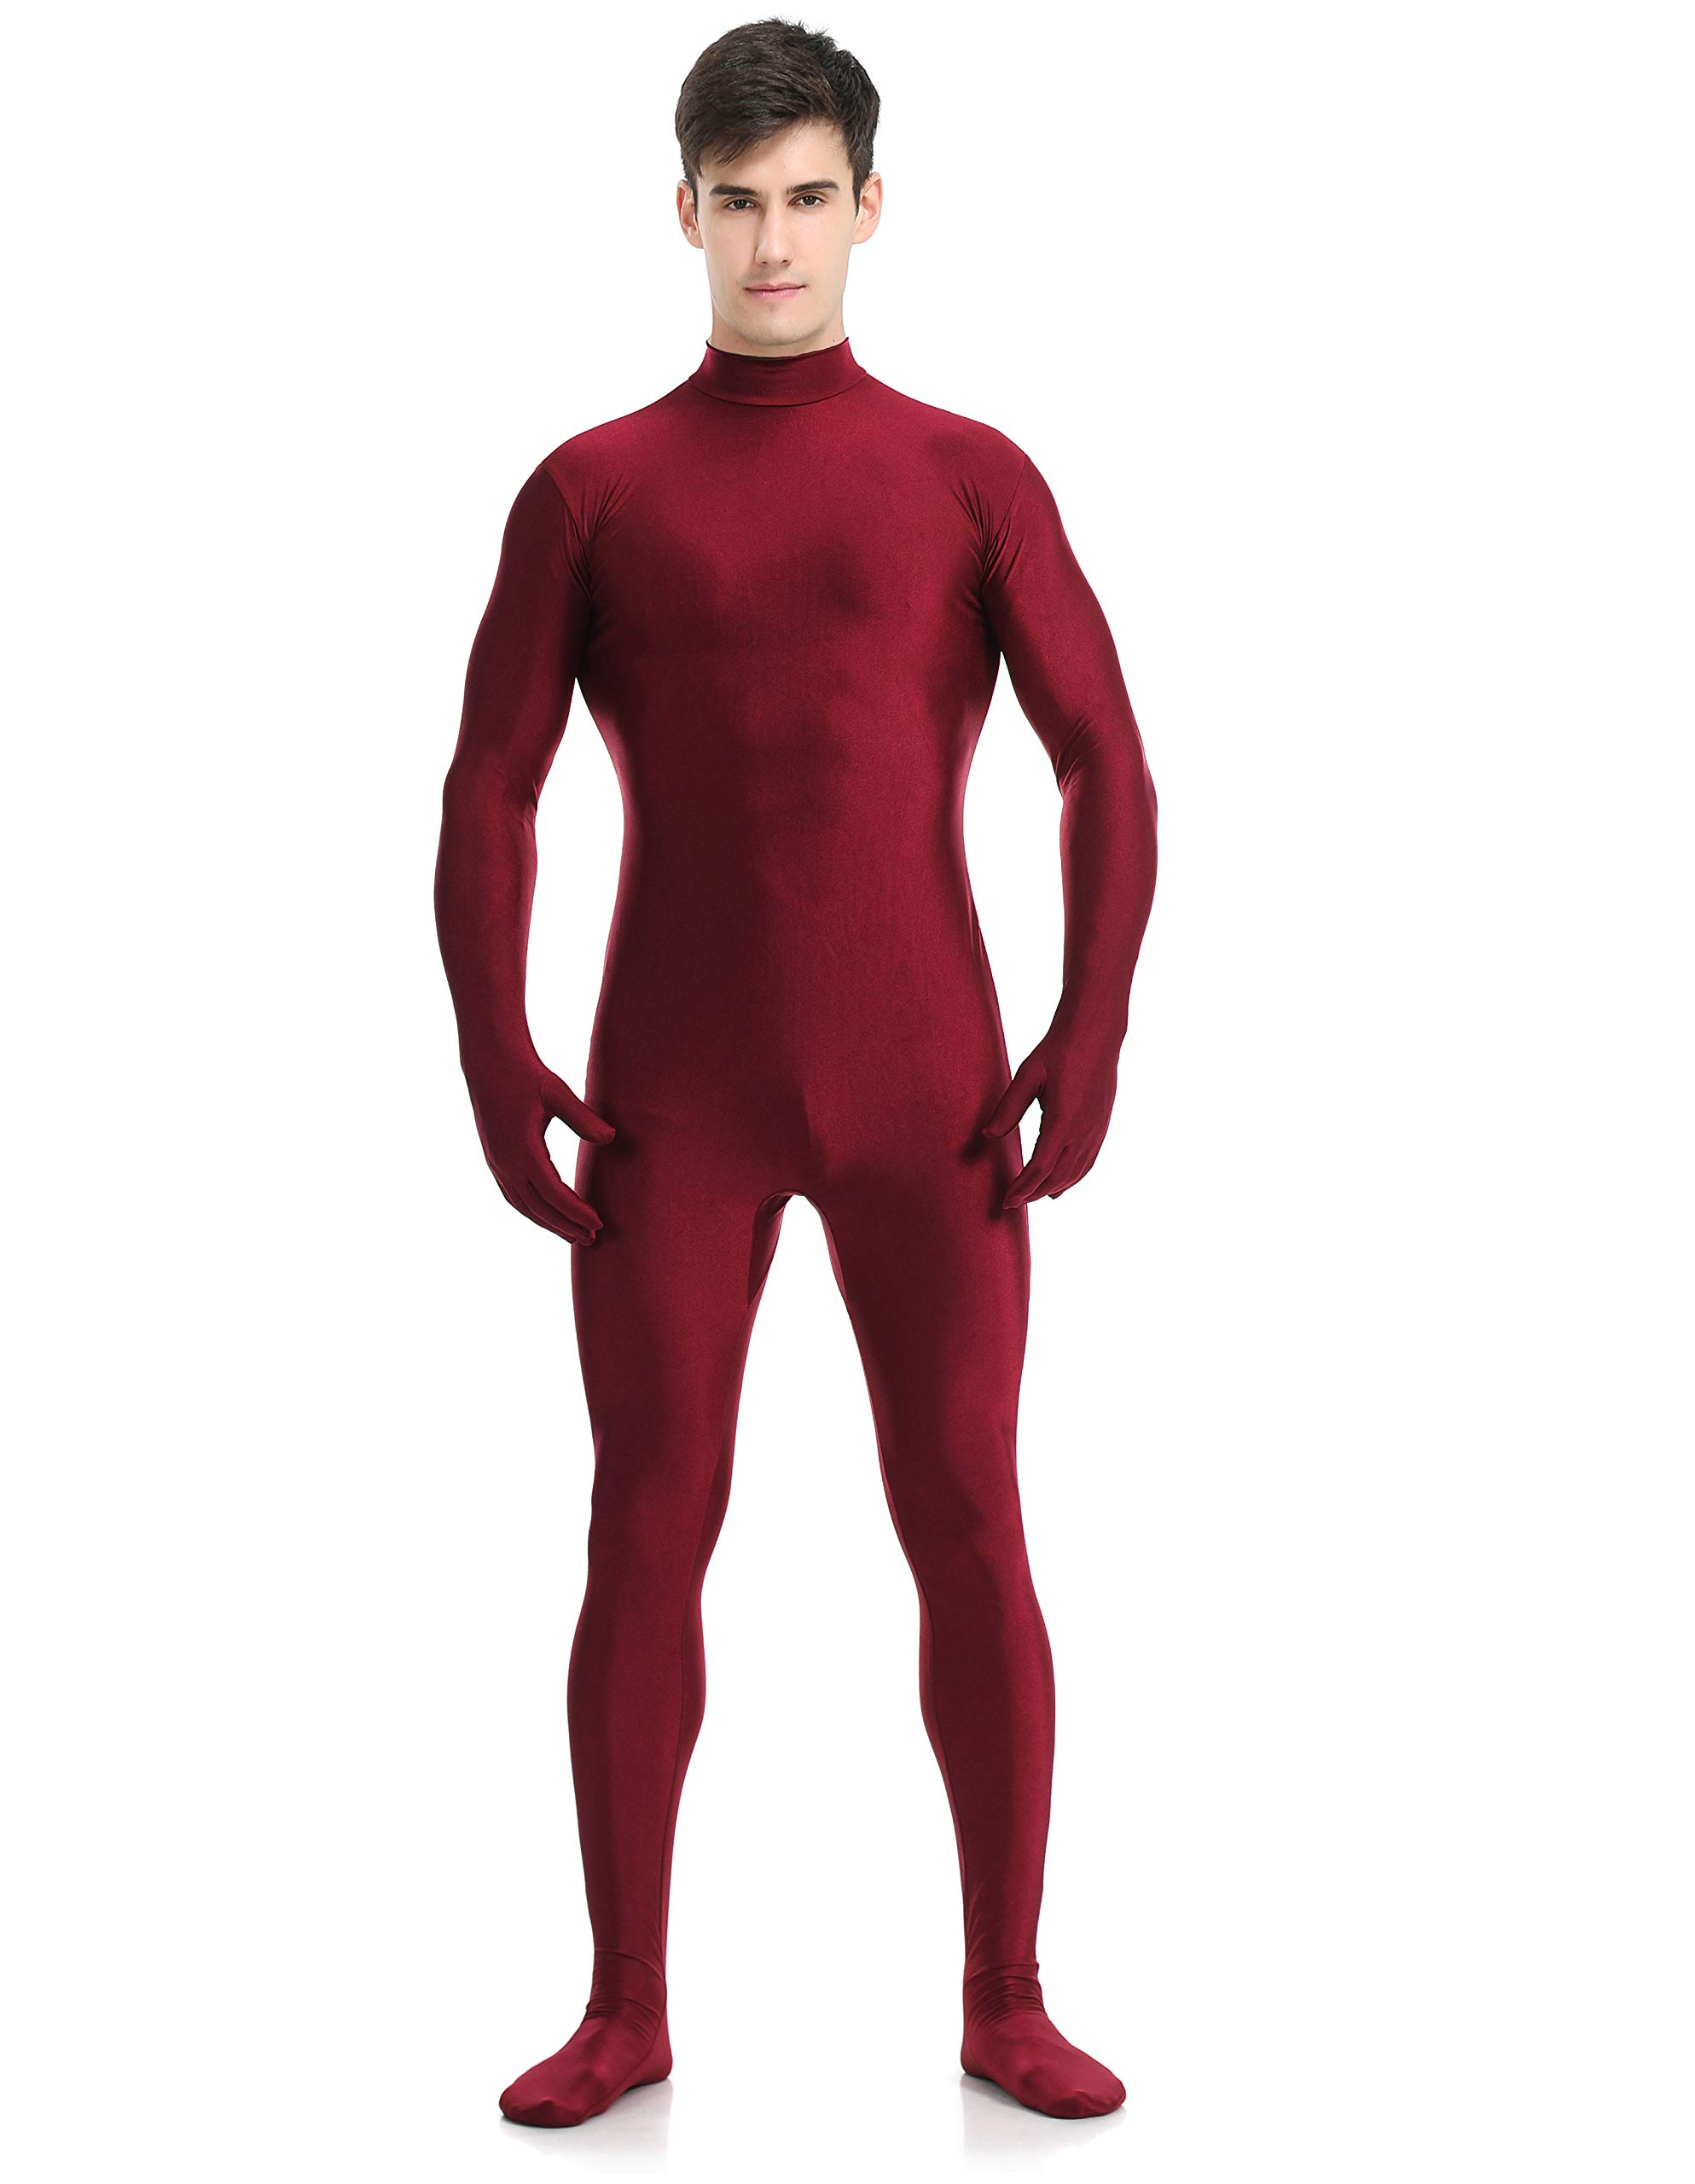 speerise Adult Full Lycra Spandex Bodysuit Unitard Costume Zentai Suit Without Hood, XS, Deepred by speerise